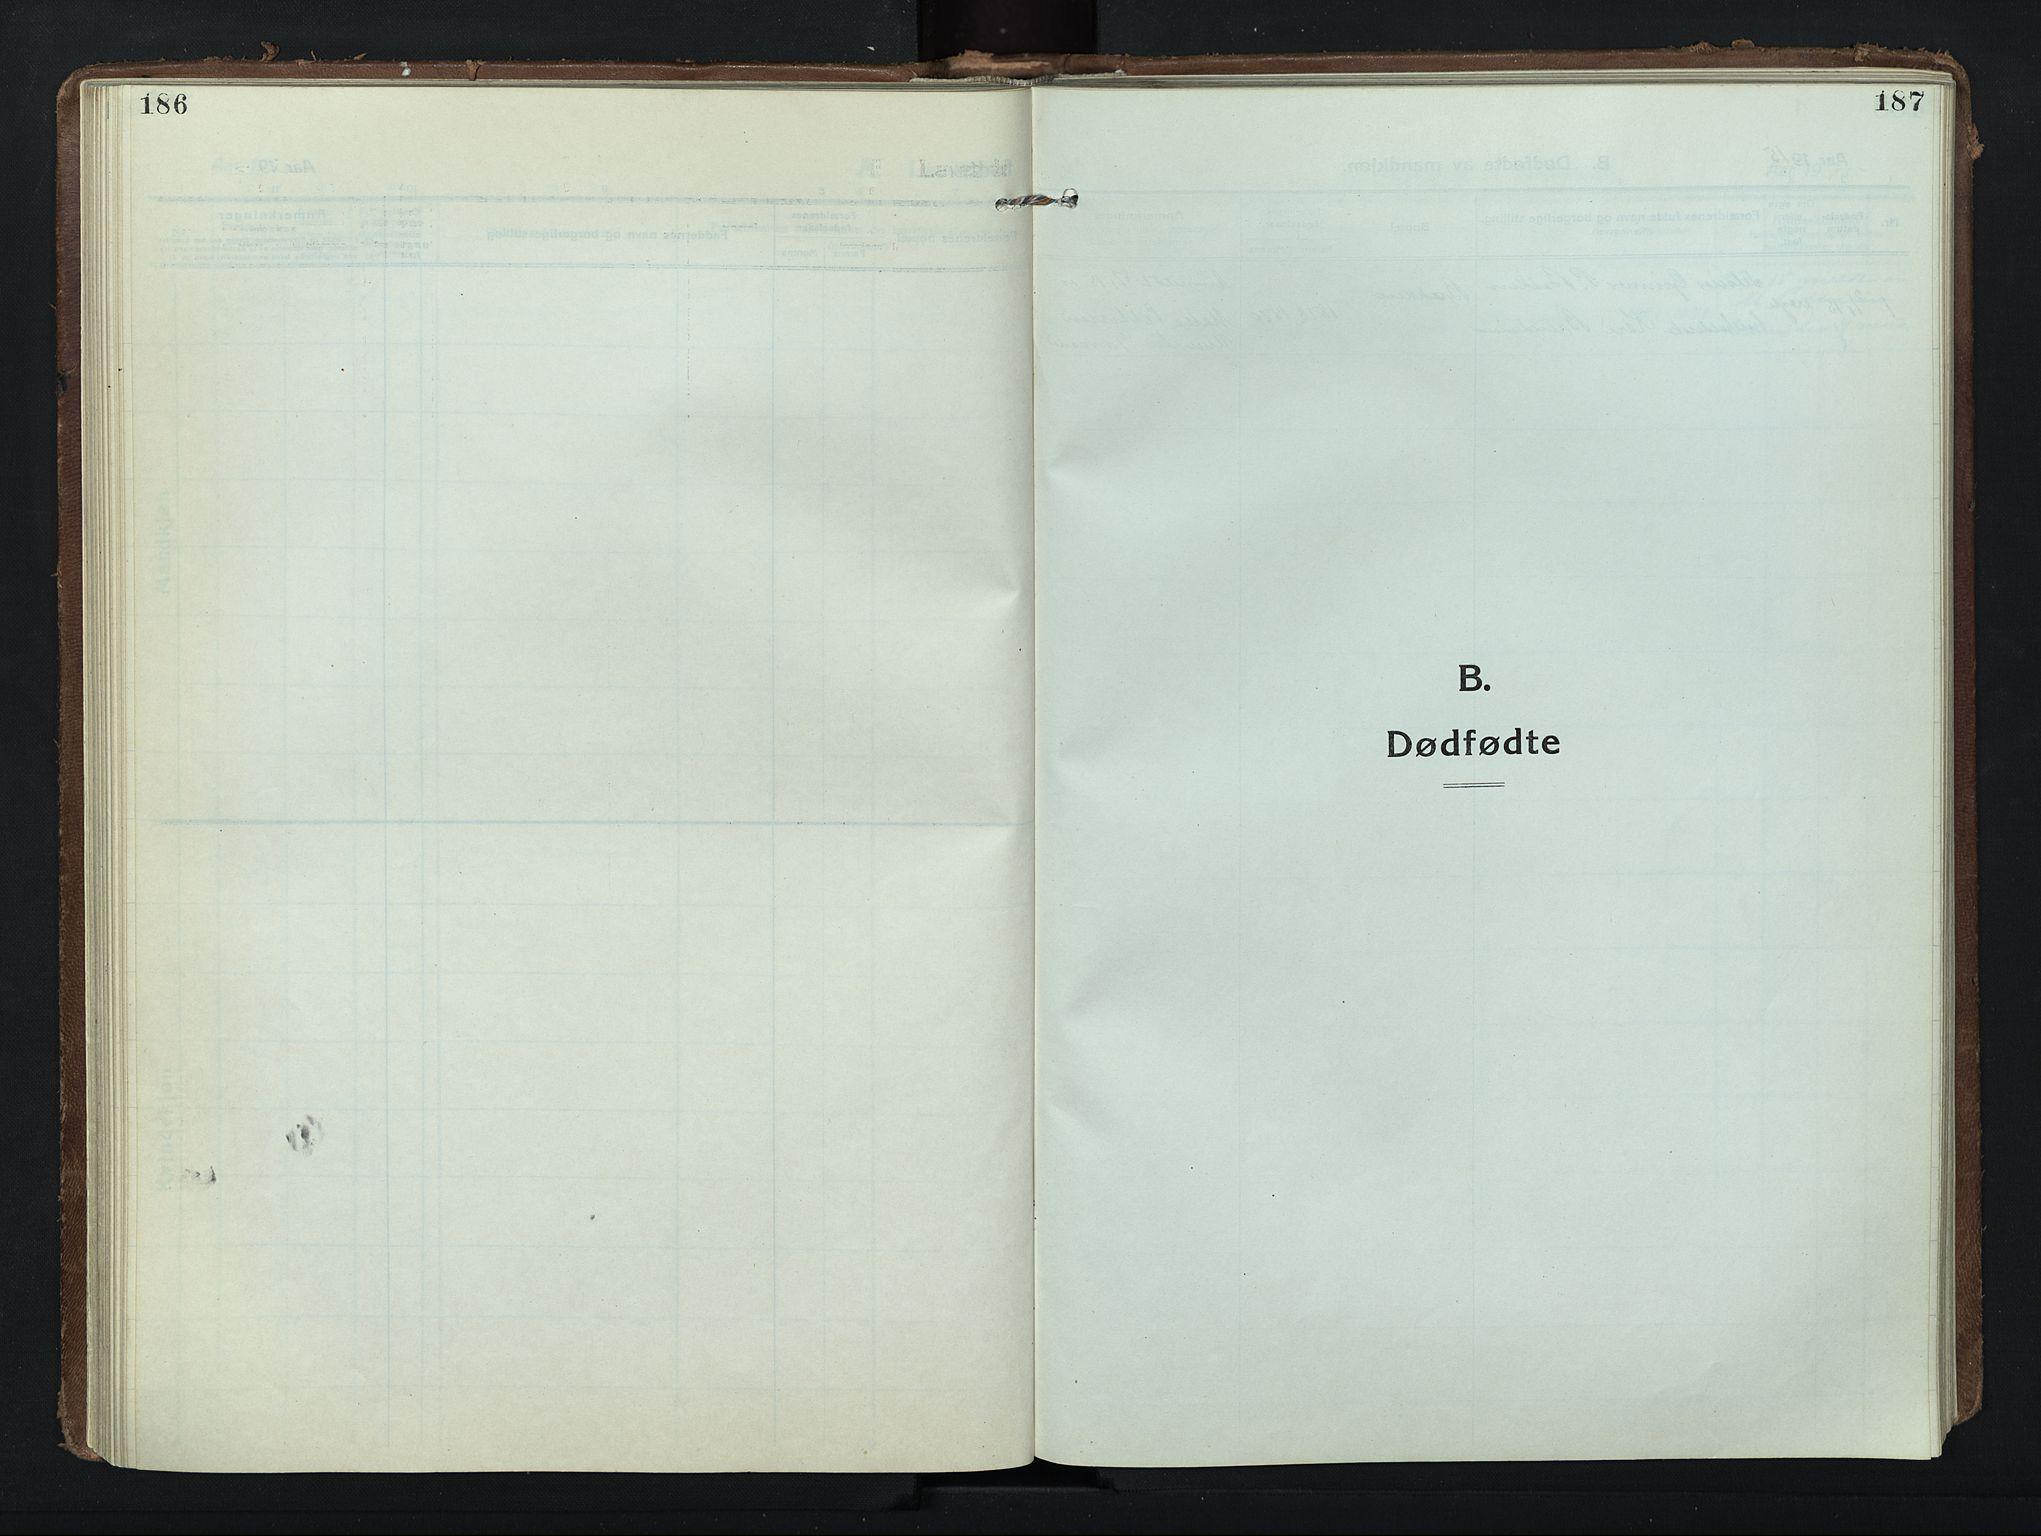 SAH, Nord-Fron prestekontor, Klokkerbok nr. 8, 1915-1948, s. 186-187